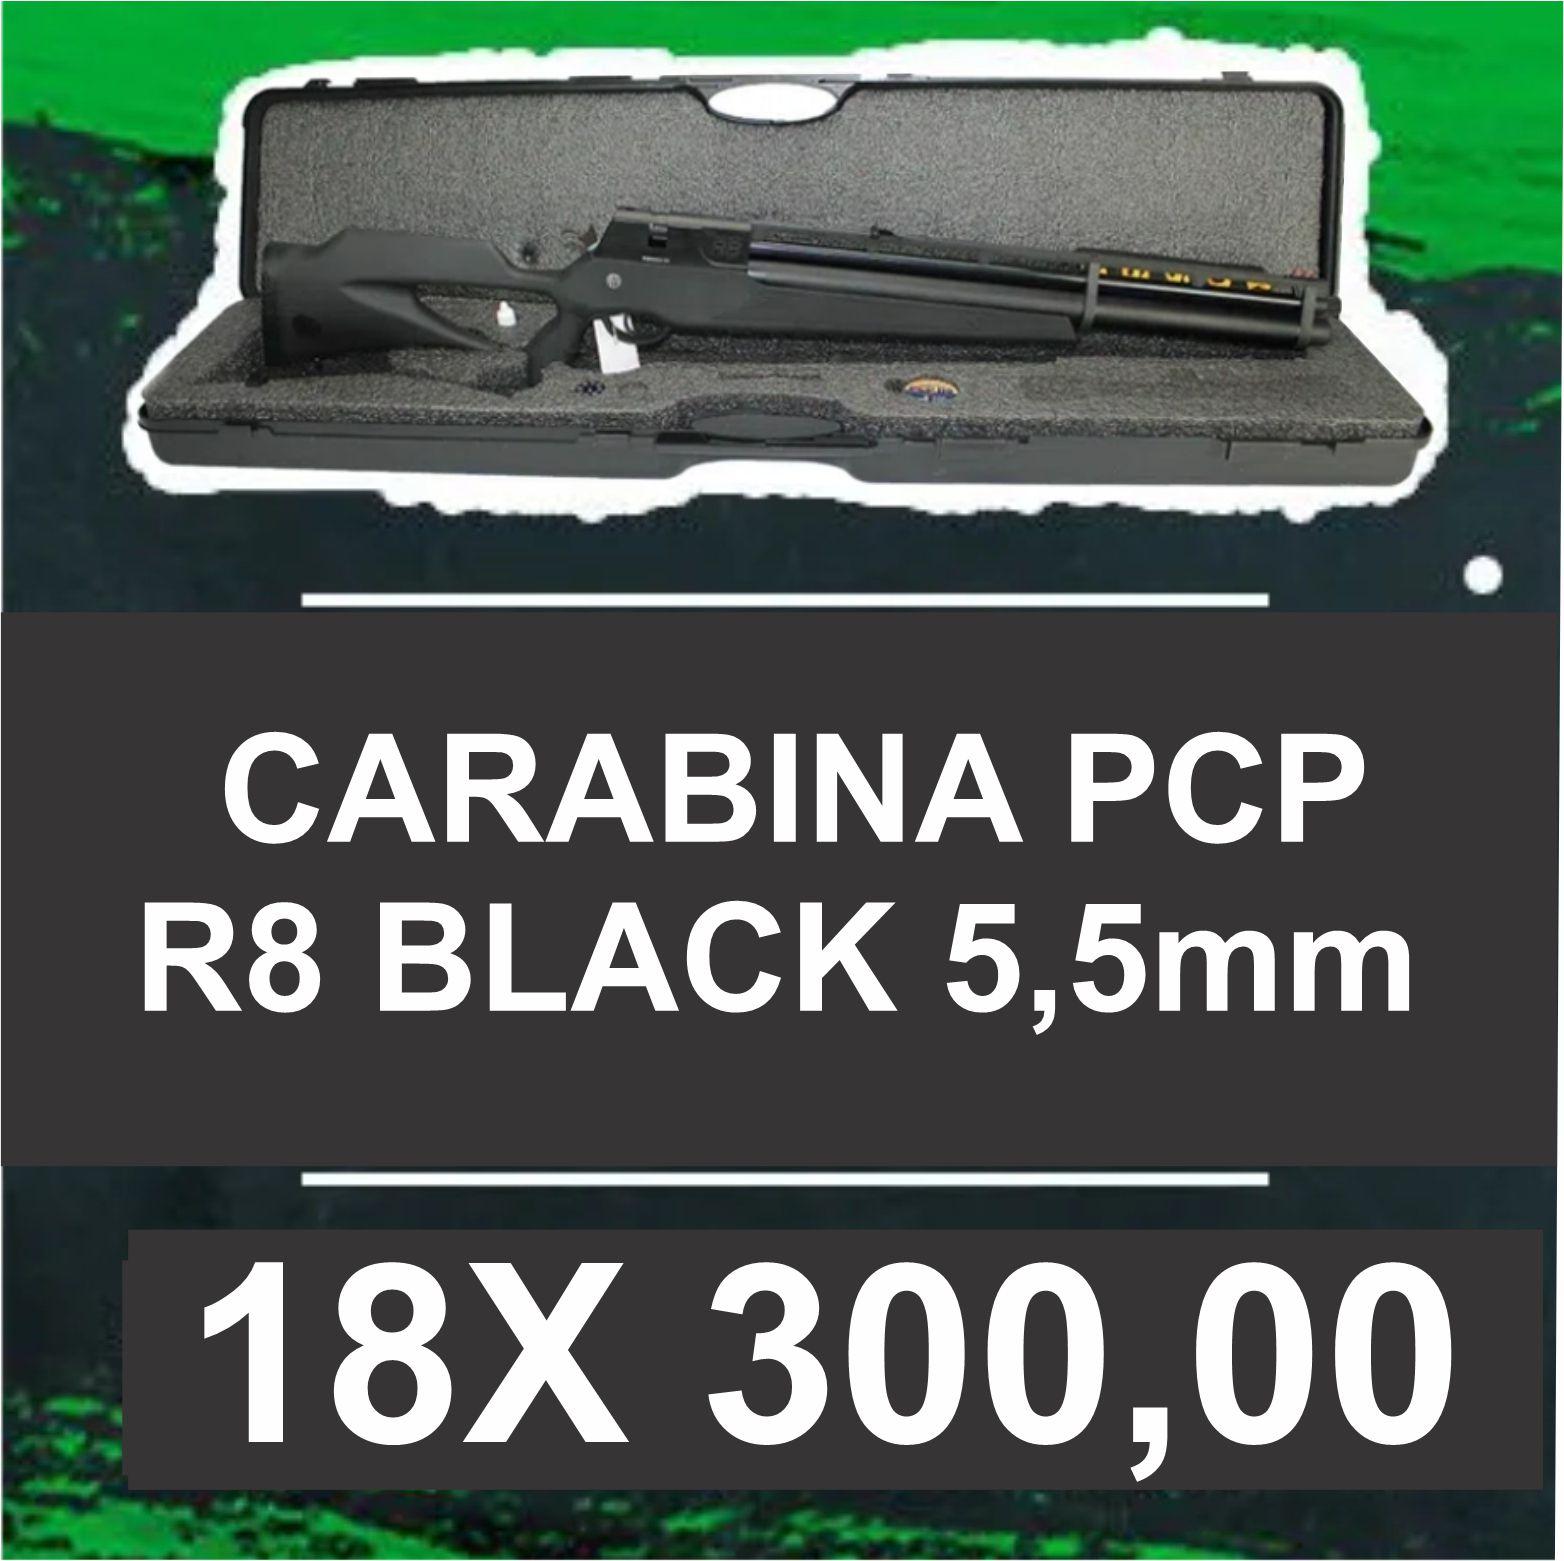 Consórcio - Carabina PCP R8 Black 5,5mm18x